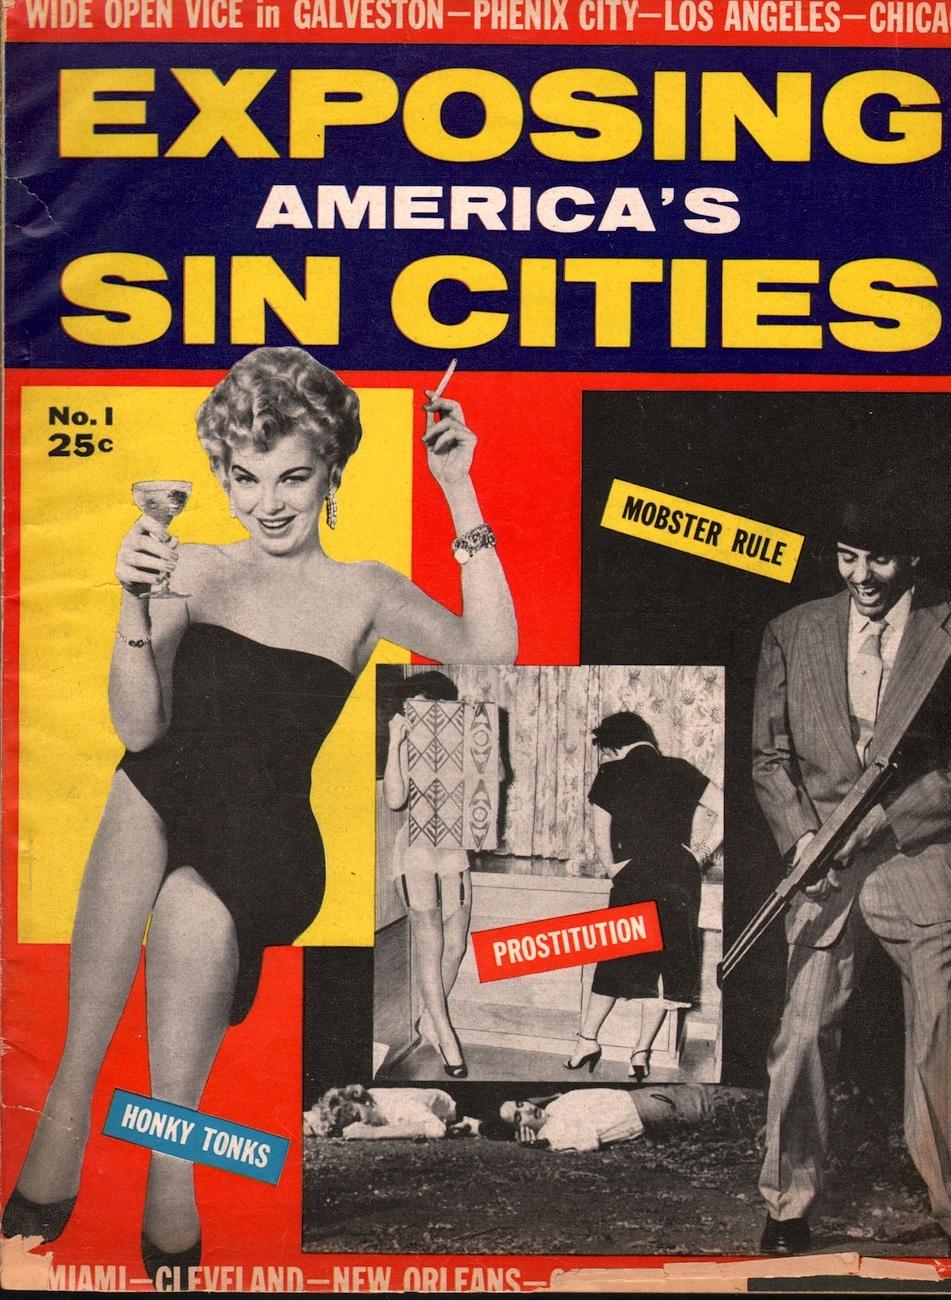 Exposing America's Sin Cities